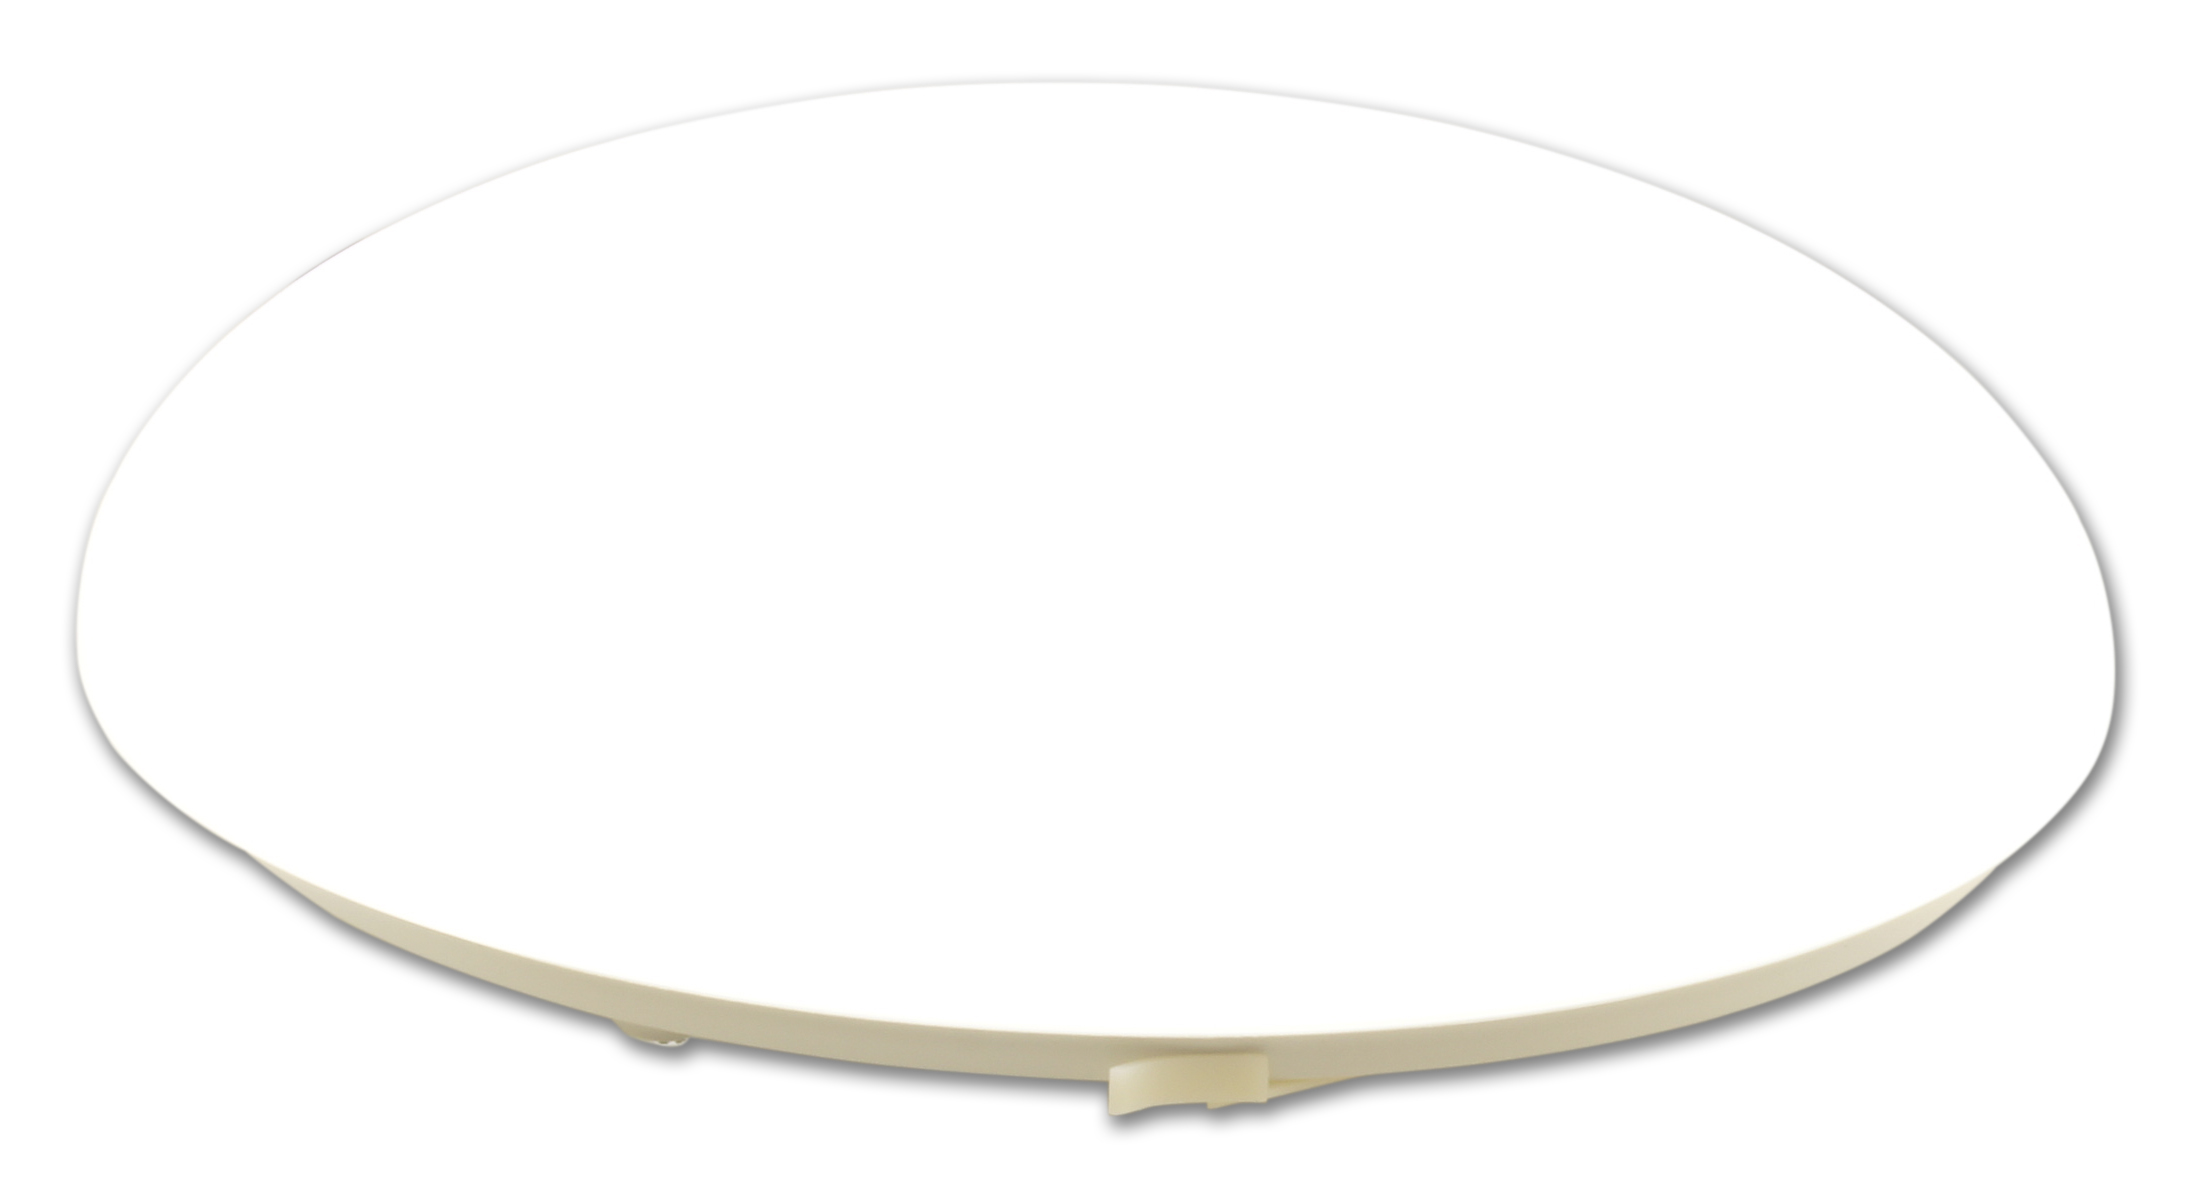 1 Stk Venus 300 LED Decken- & Wandleuchte, 17W, 4000K, IP44 RA 80+ LIDW300103